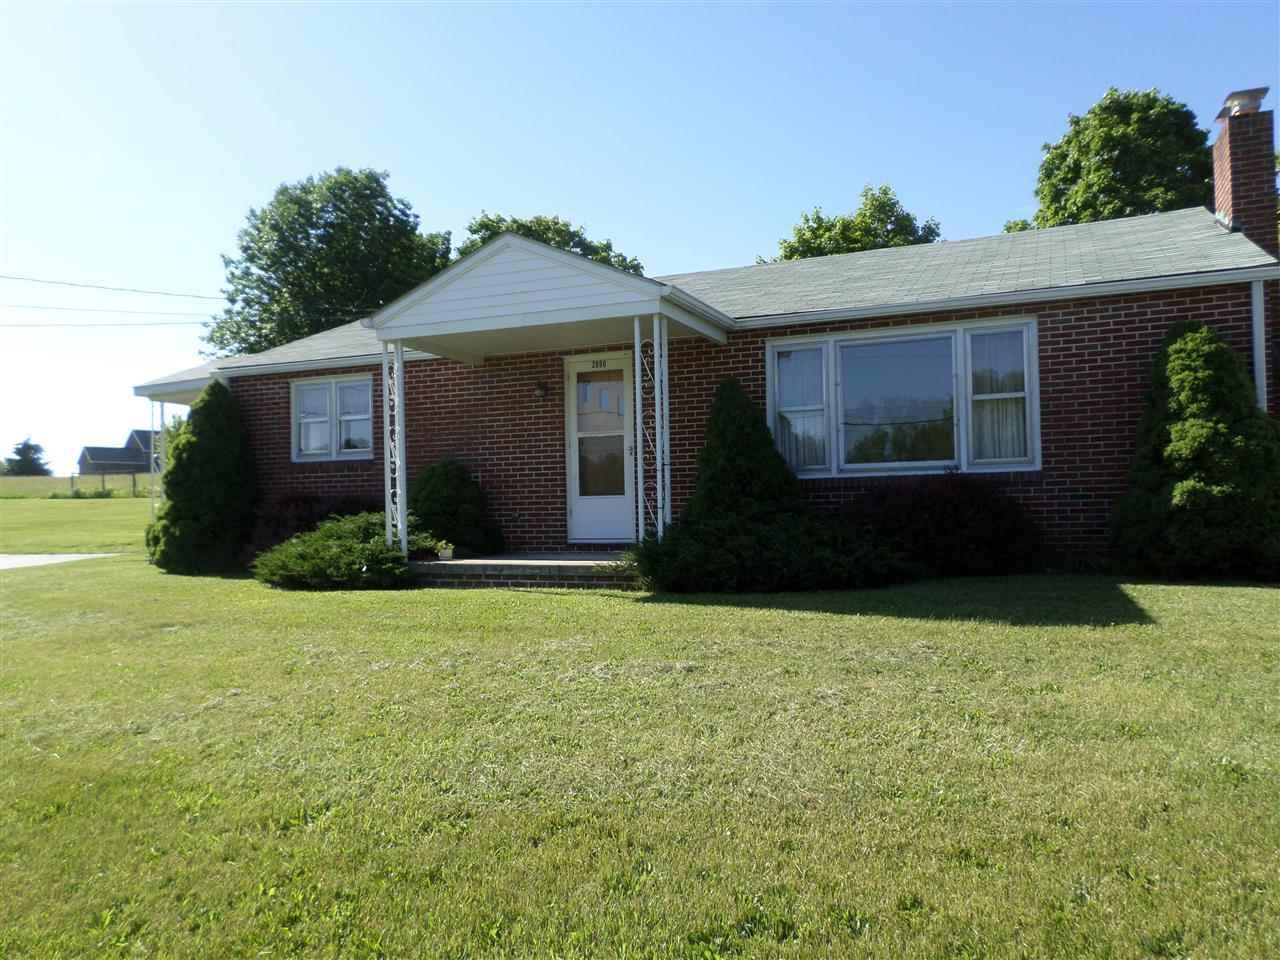 2890 Fairfield Rd, Gettysburg, PA 17325